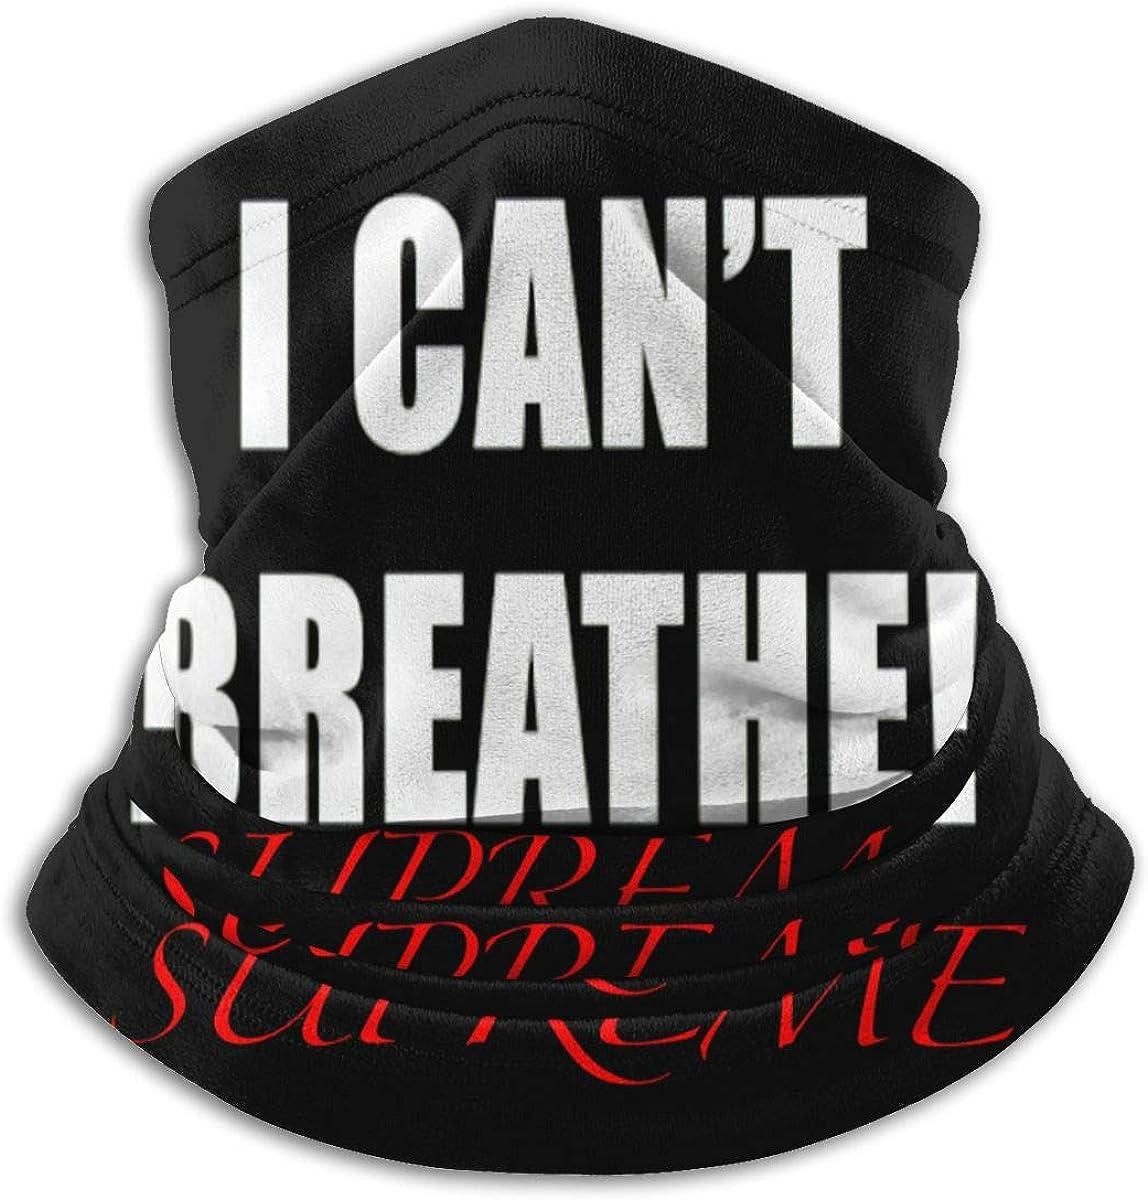 I Can't Breathe Neck Windproof Bandanas Headwrap Balaclava Scarf Headband Microfiber Neck Warmer